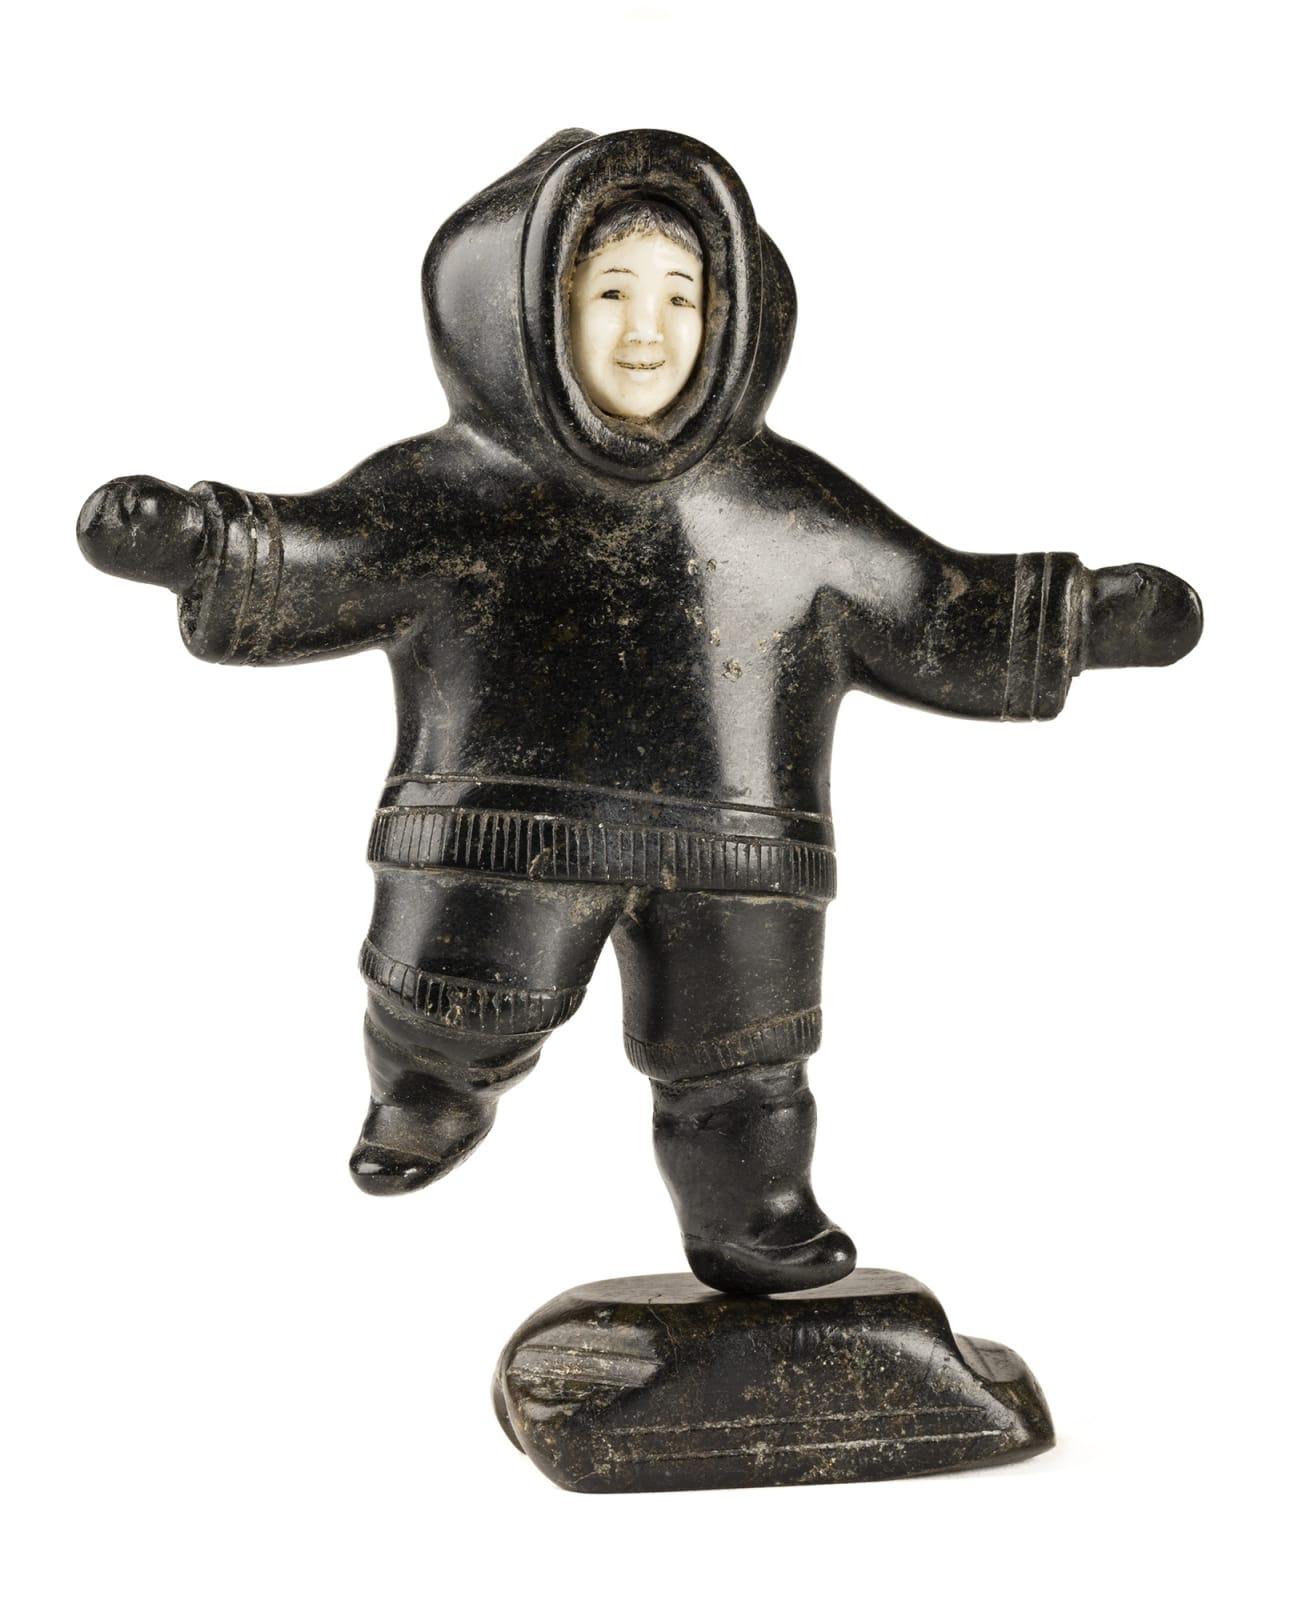 Lot 16 SHEOKJUK OQUTAQ (1920-1982) m., KIMMIRUT/KINNGAIT (LAKE HARBOUR/CAPE DORSET) Running Boy, c. 1952-54 stone, ivory, and black colouring, 5 x 4.25 x 1.5 in (12.7 x 10.8 x 3.8 cm) Estimate: $6,000 — $9,000 Price realiZed: $16,800